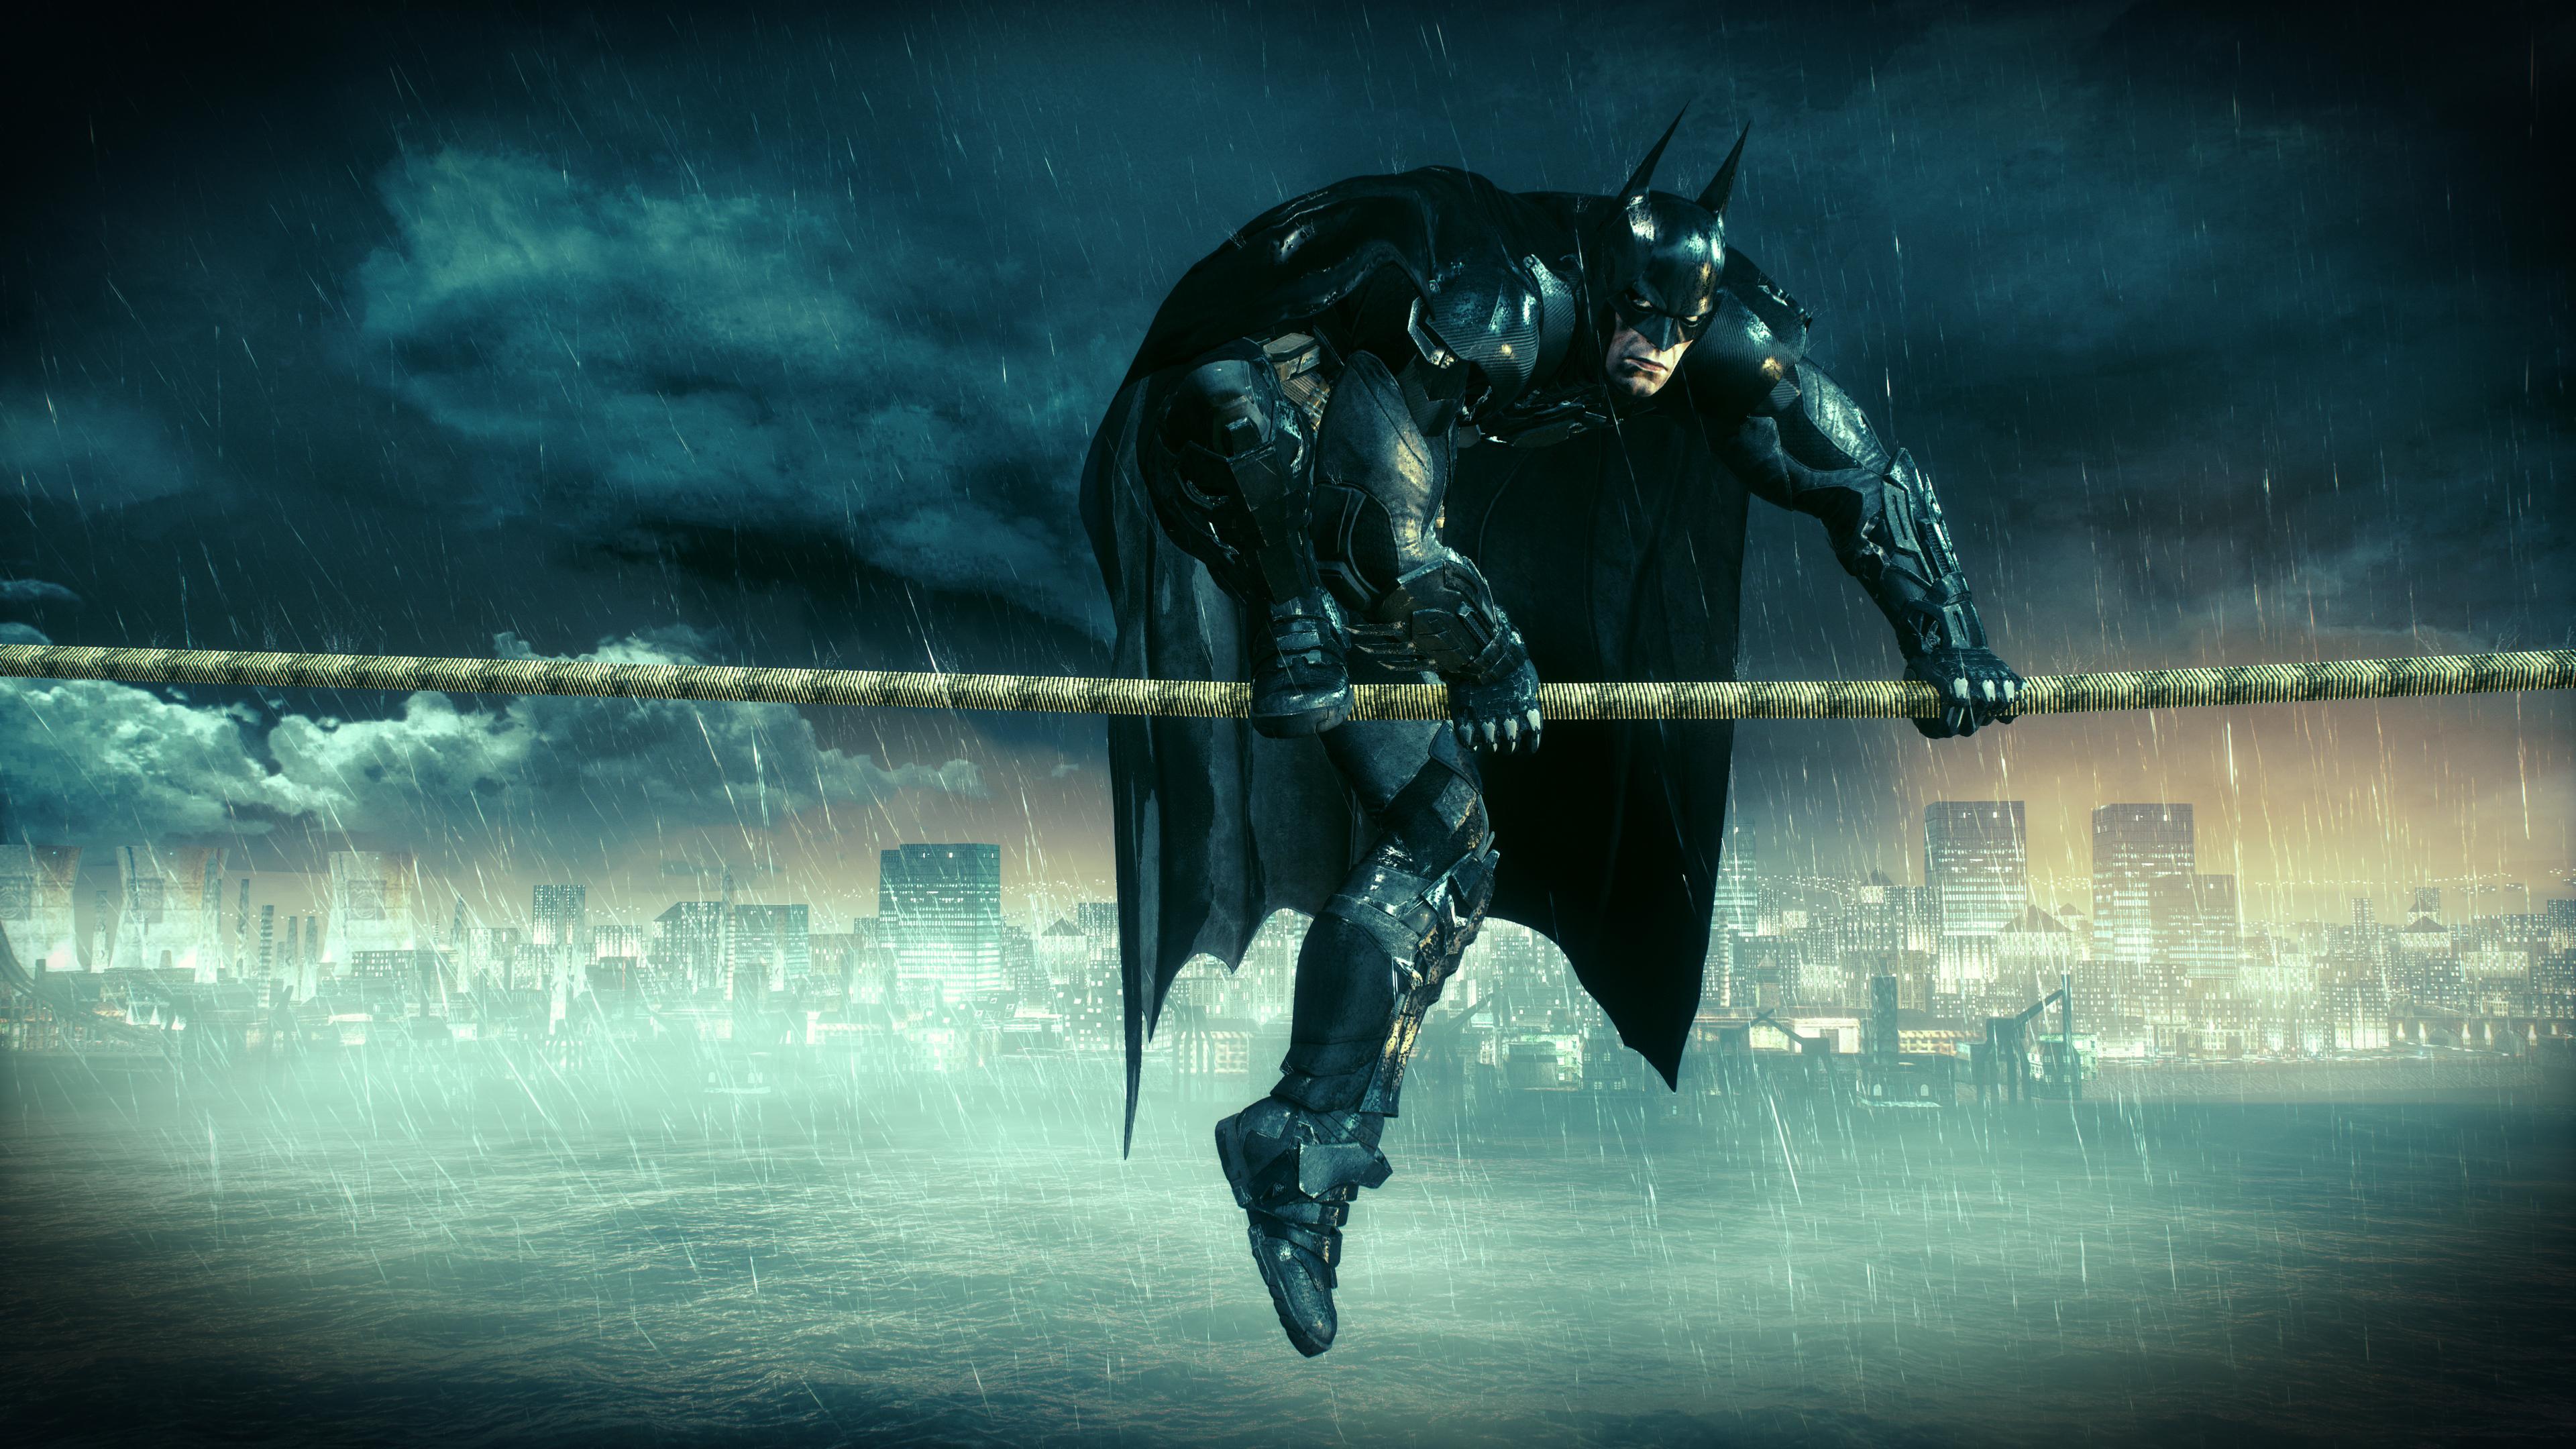 4k batman arkham knight 1554244394 - 4k Batman Arkham Knight - hd-wallpapers, games wallpapers, batman wallpapers, 5k wallpapers, 4k-wallpapers